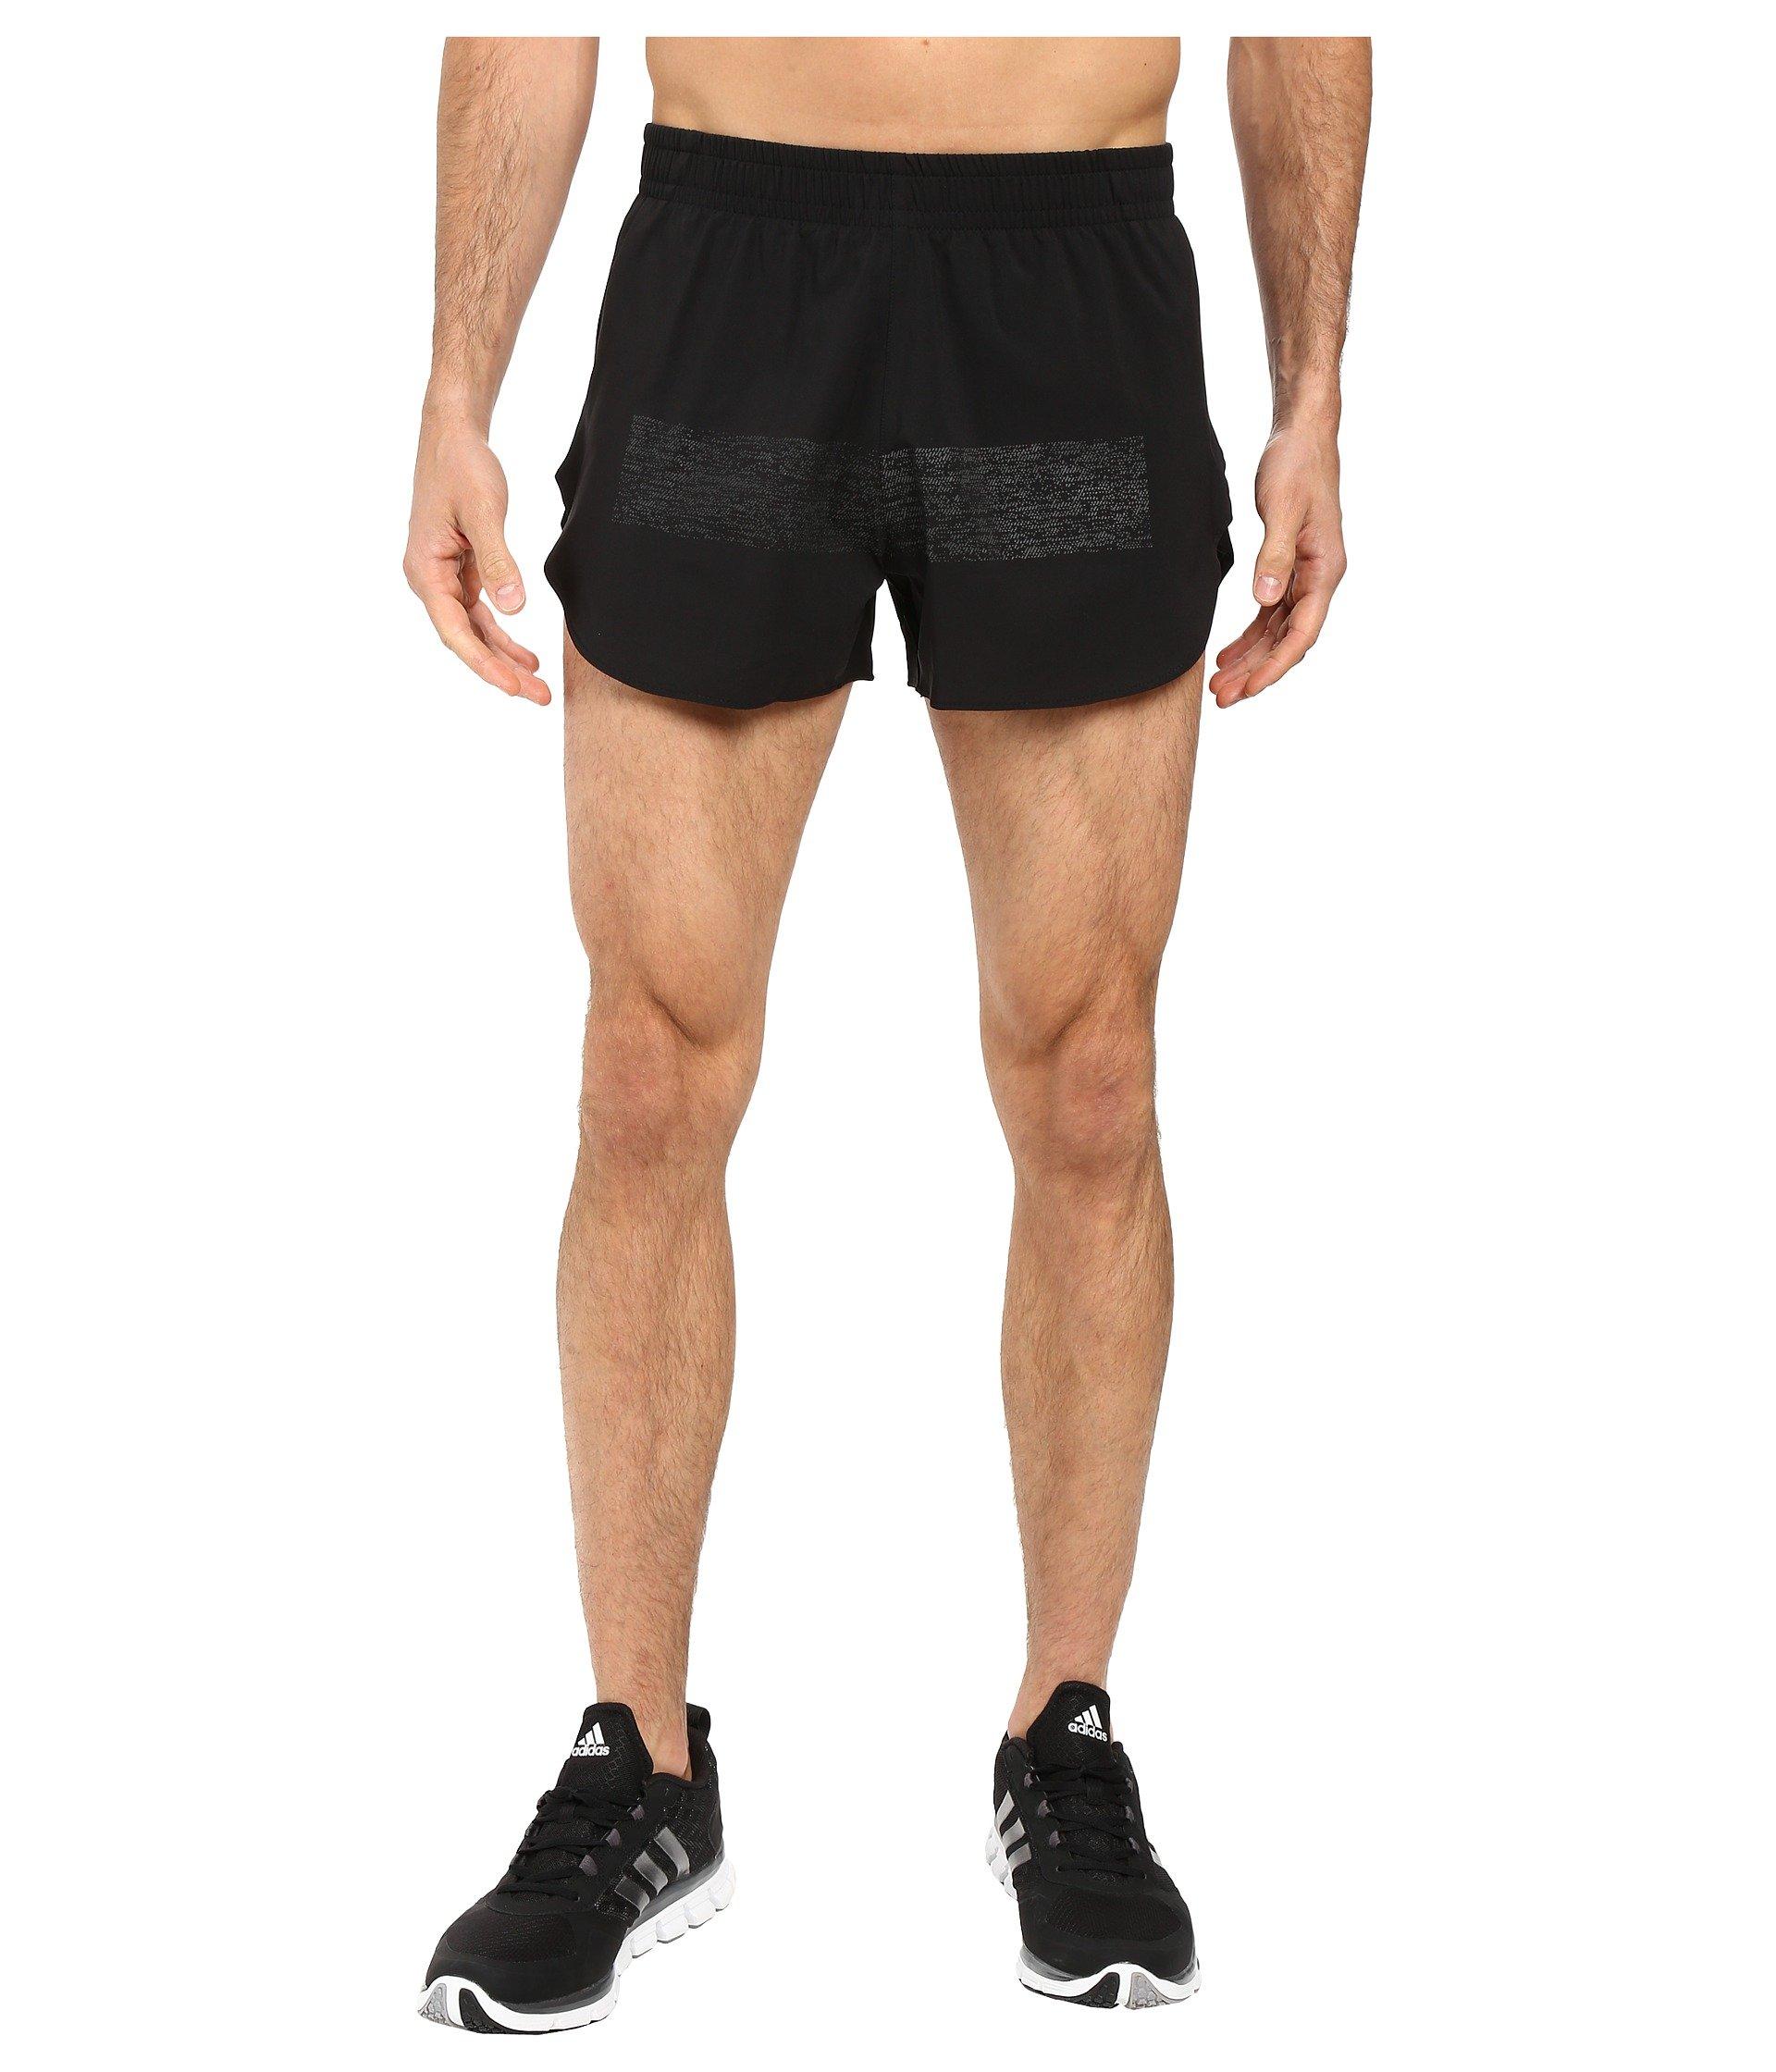 adidas Men's Supernova Climalite Running Shorts, Black, Small